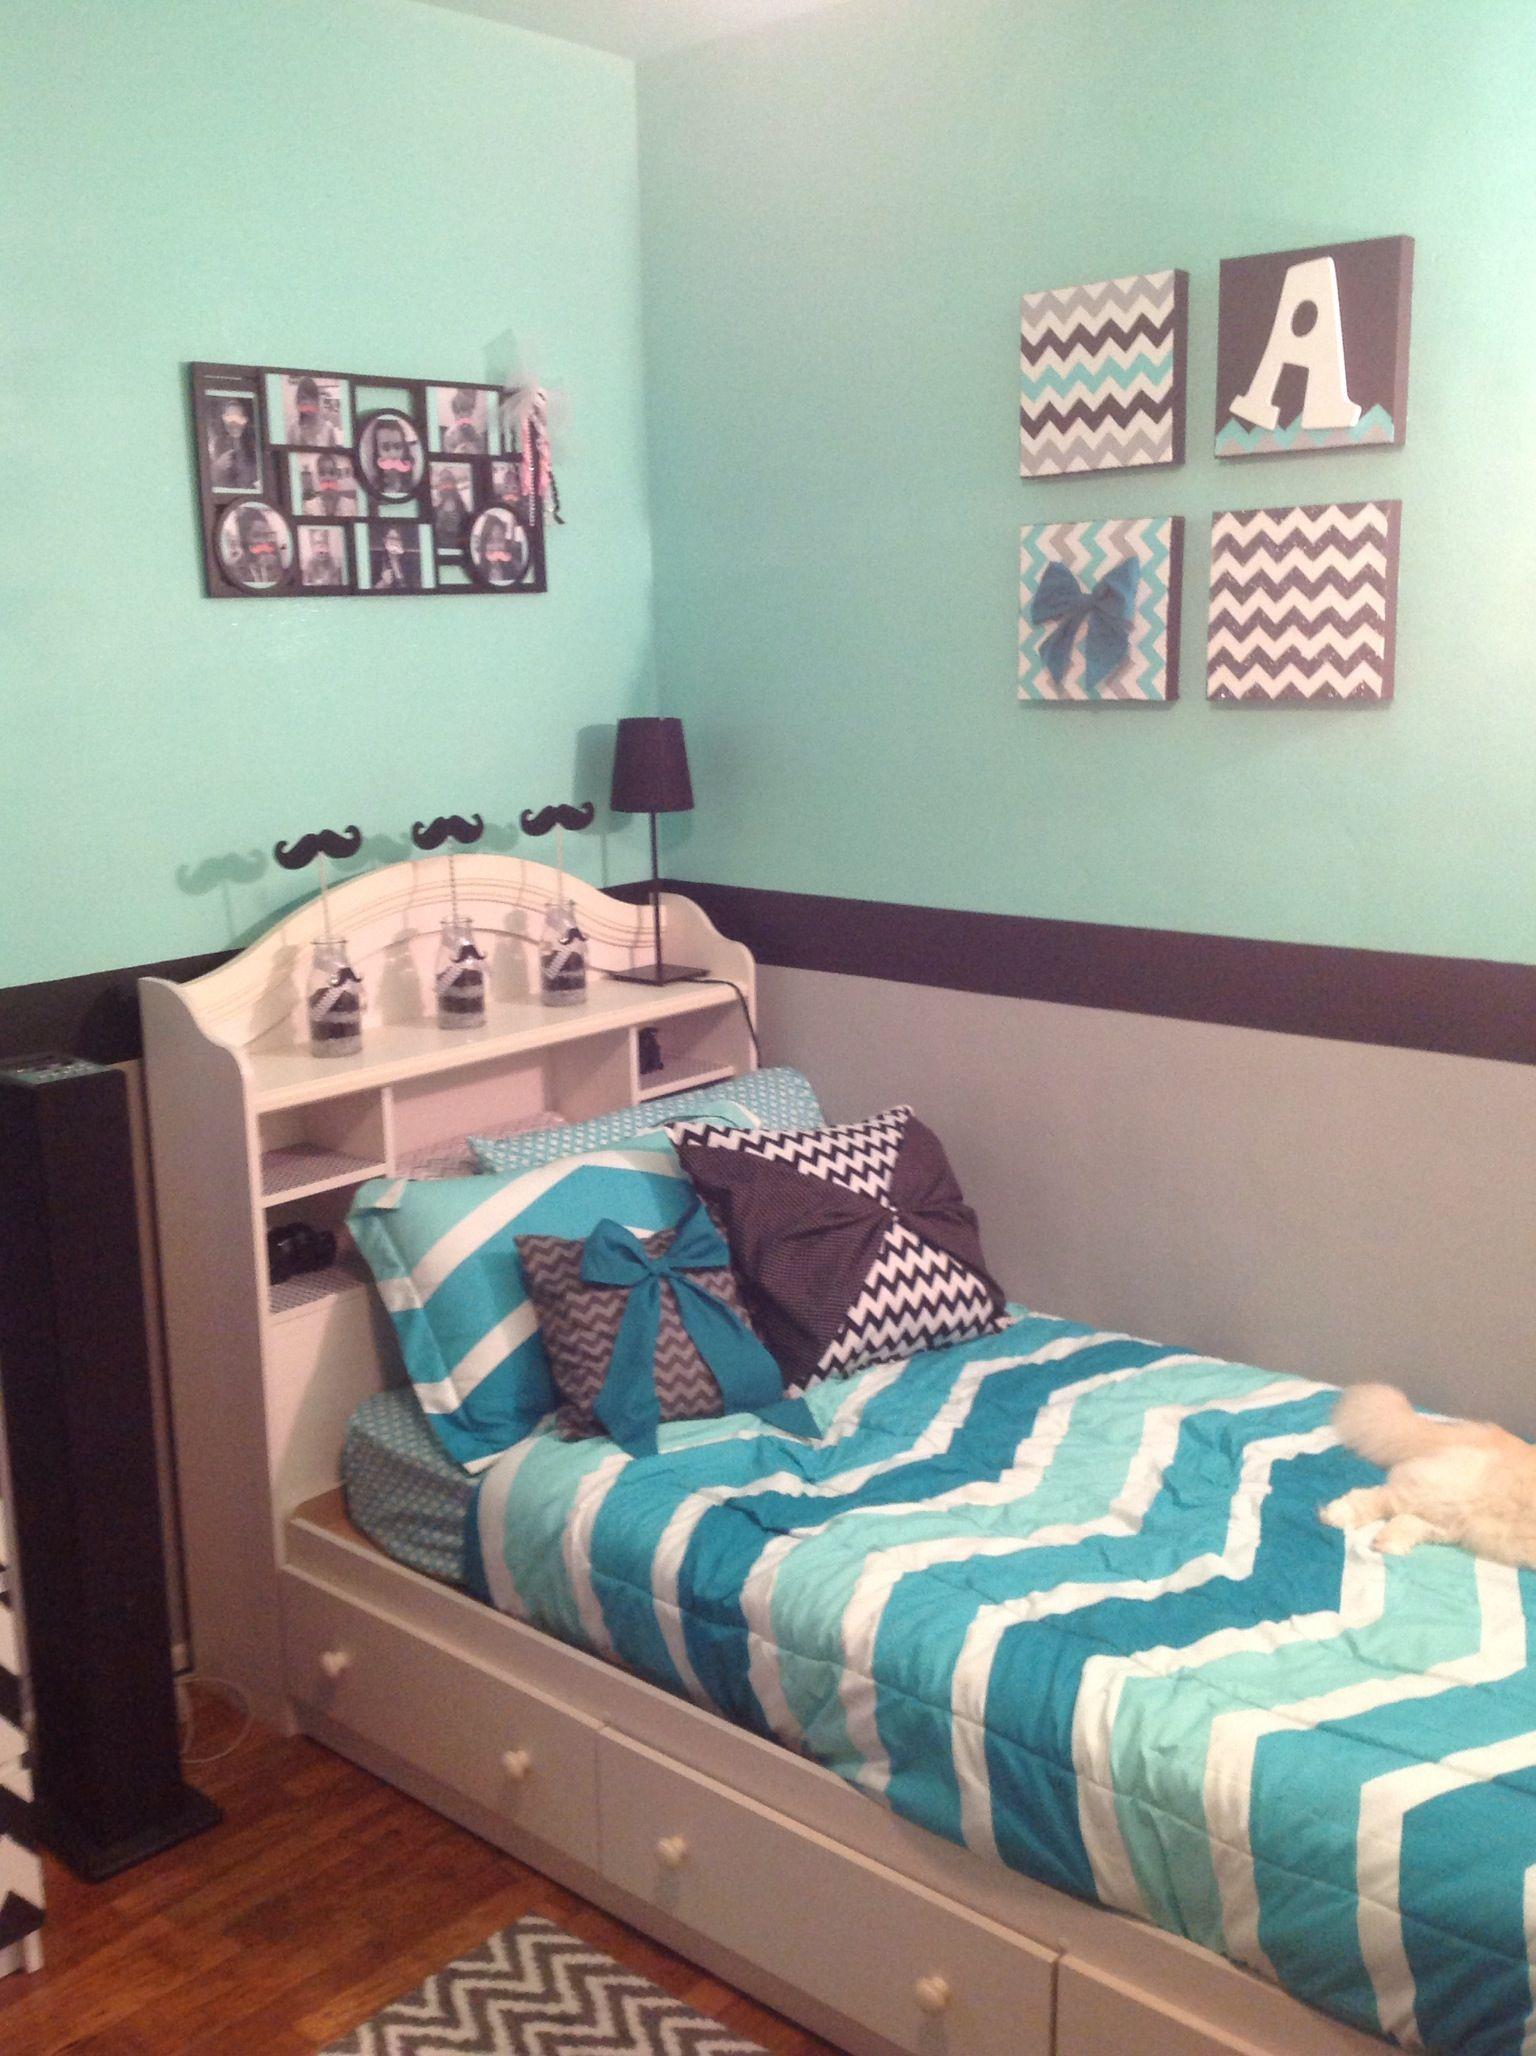 Bedroom Decorating Ideas Mint Green chevron bedrooms